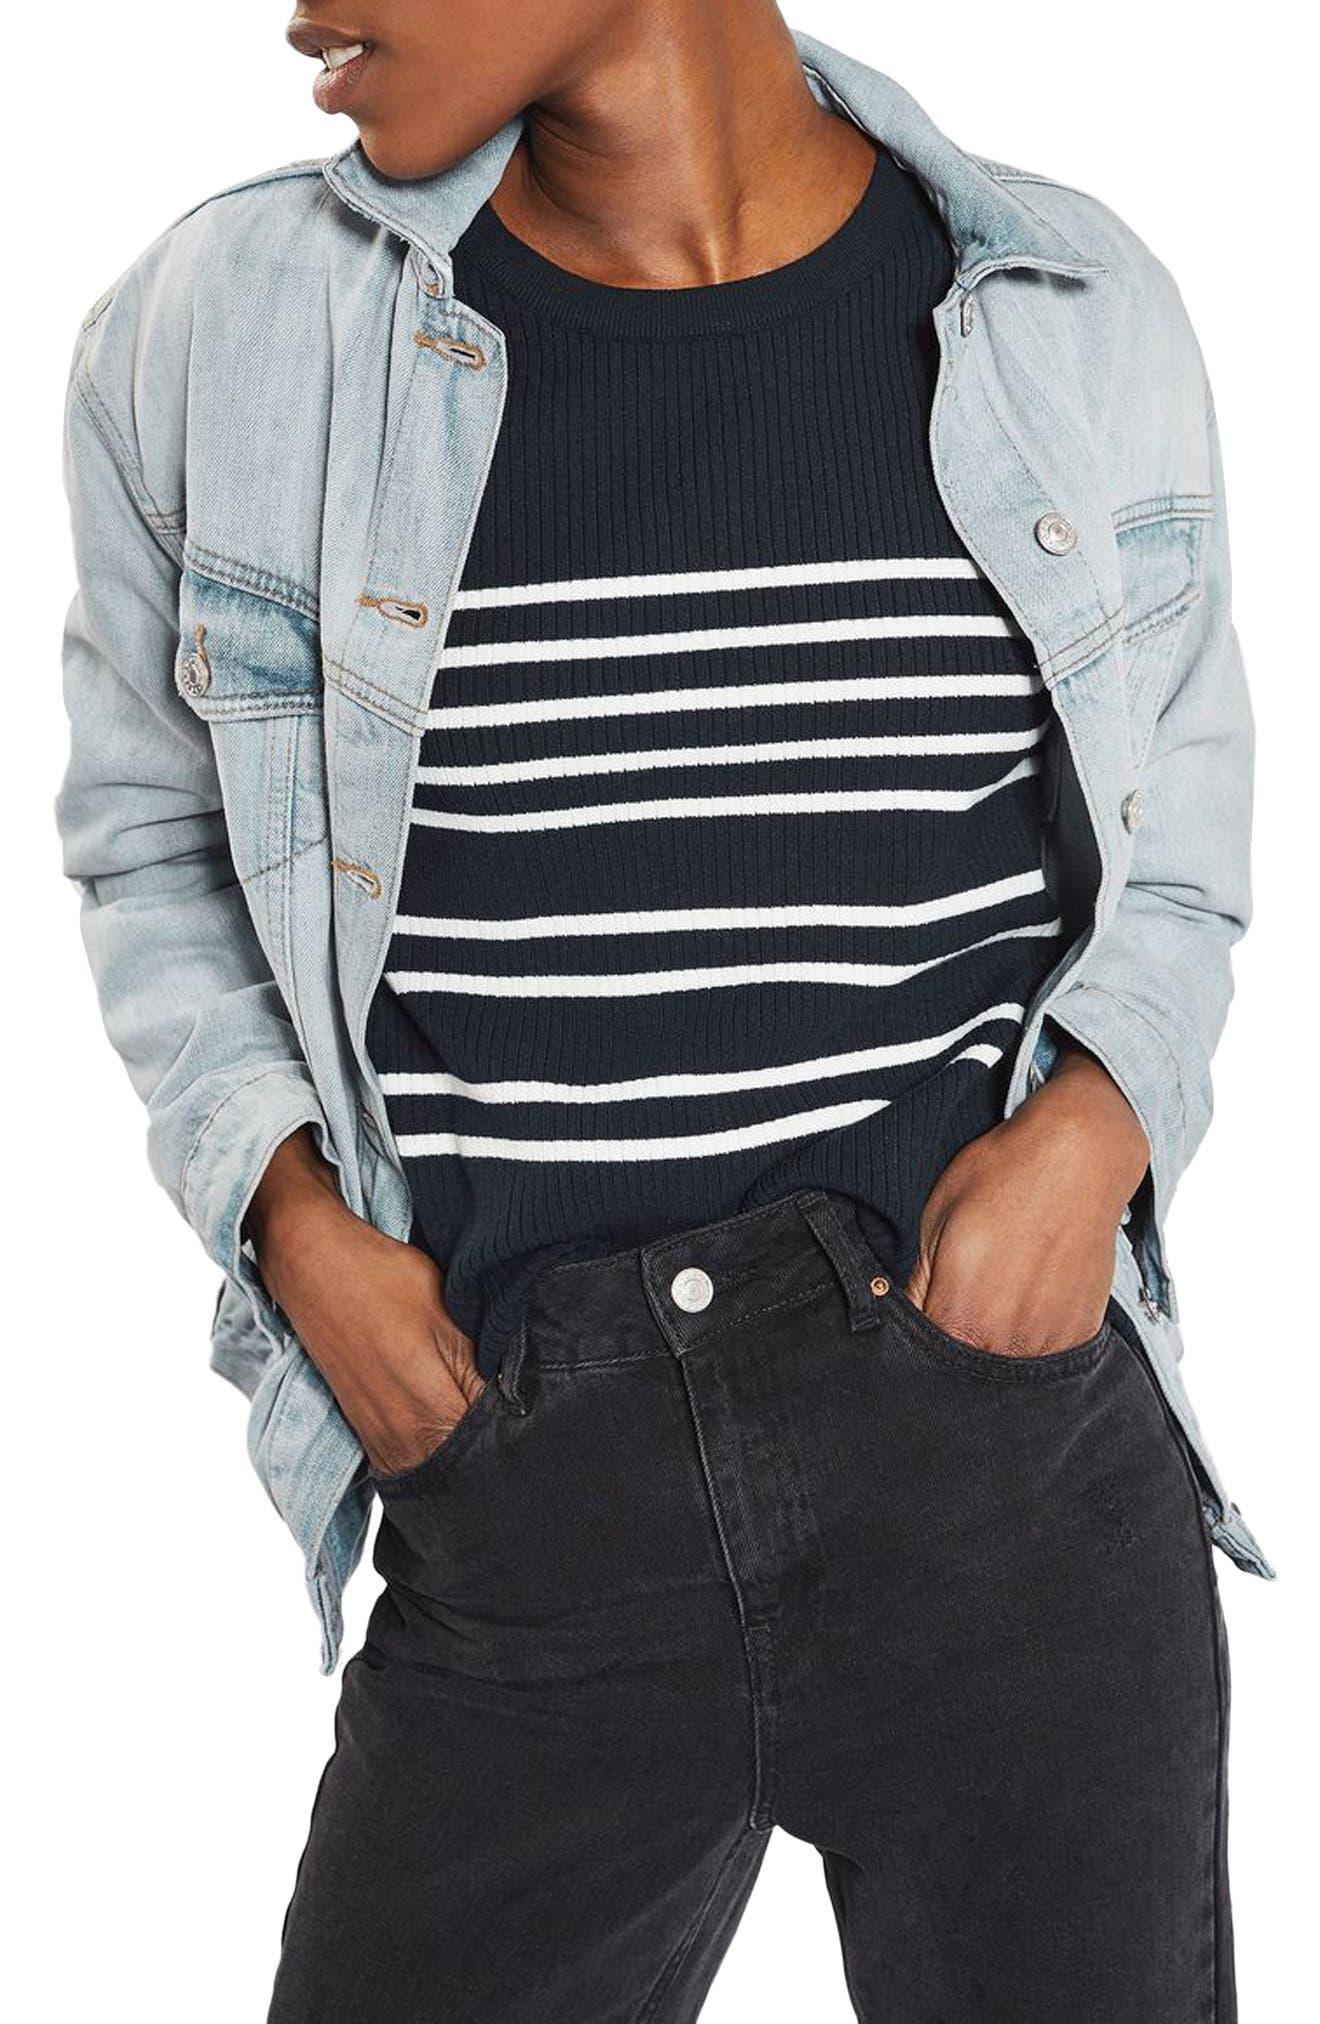 Topshop Oversize Denim Jacket